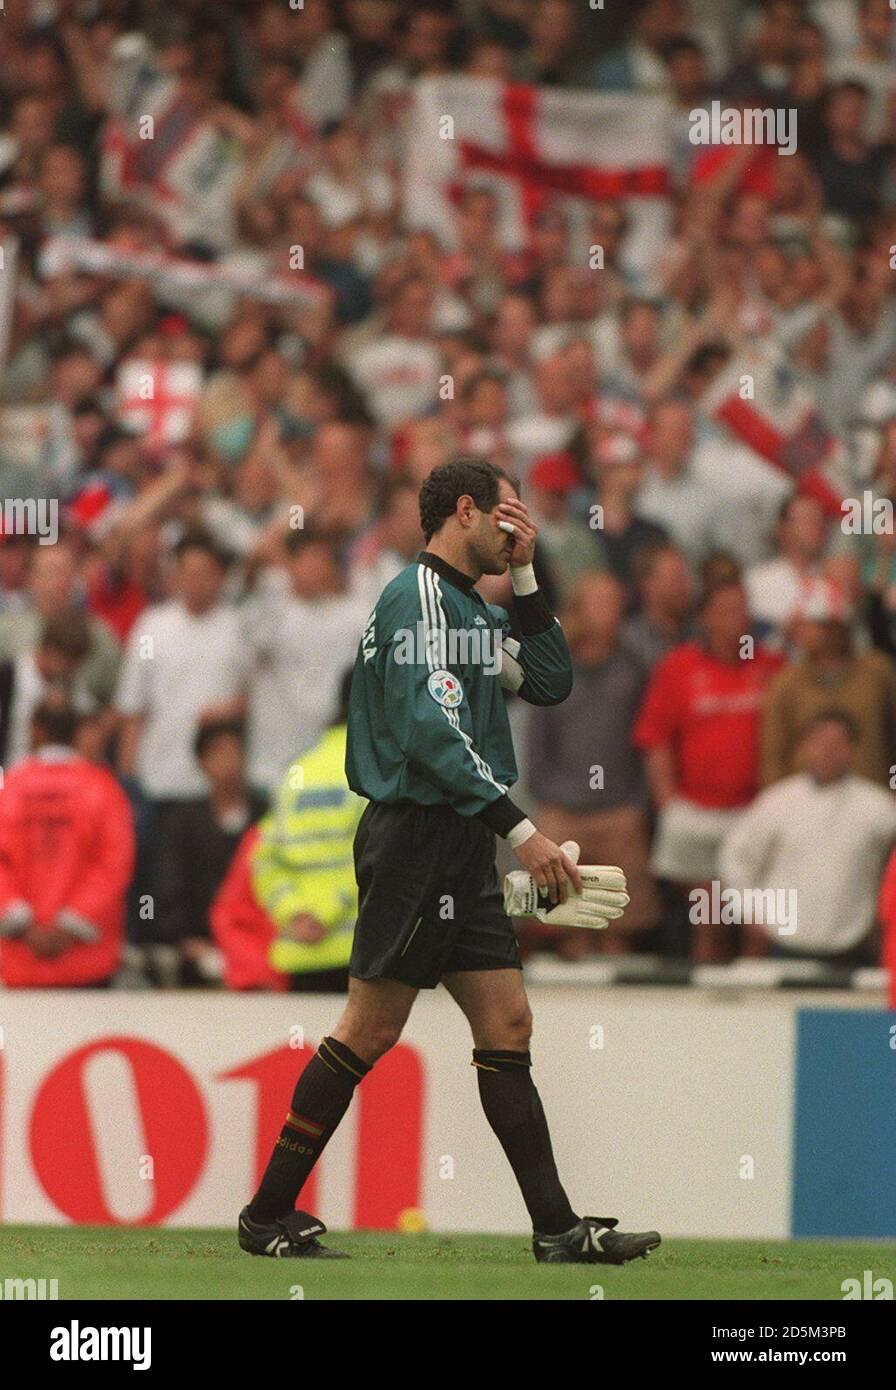 22-JUN-96 ..England v Spain ... Spain's Andoni Zubizarreta walks off dejected after losing to England Stock Photo